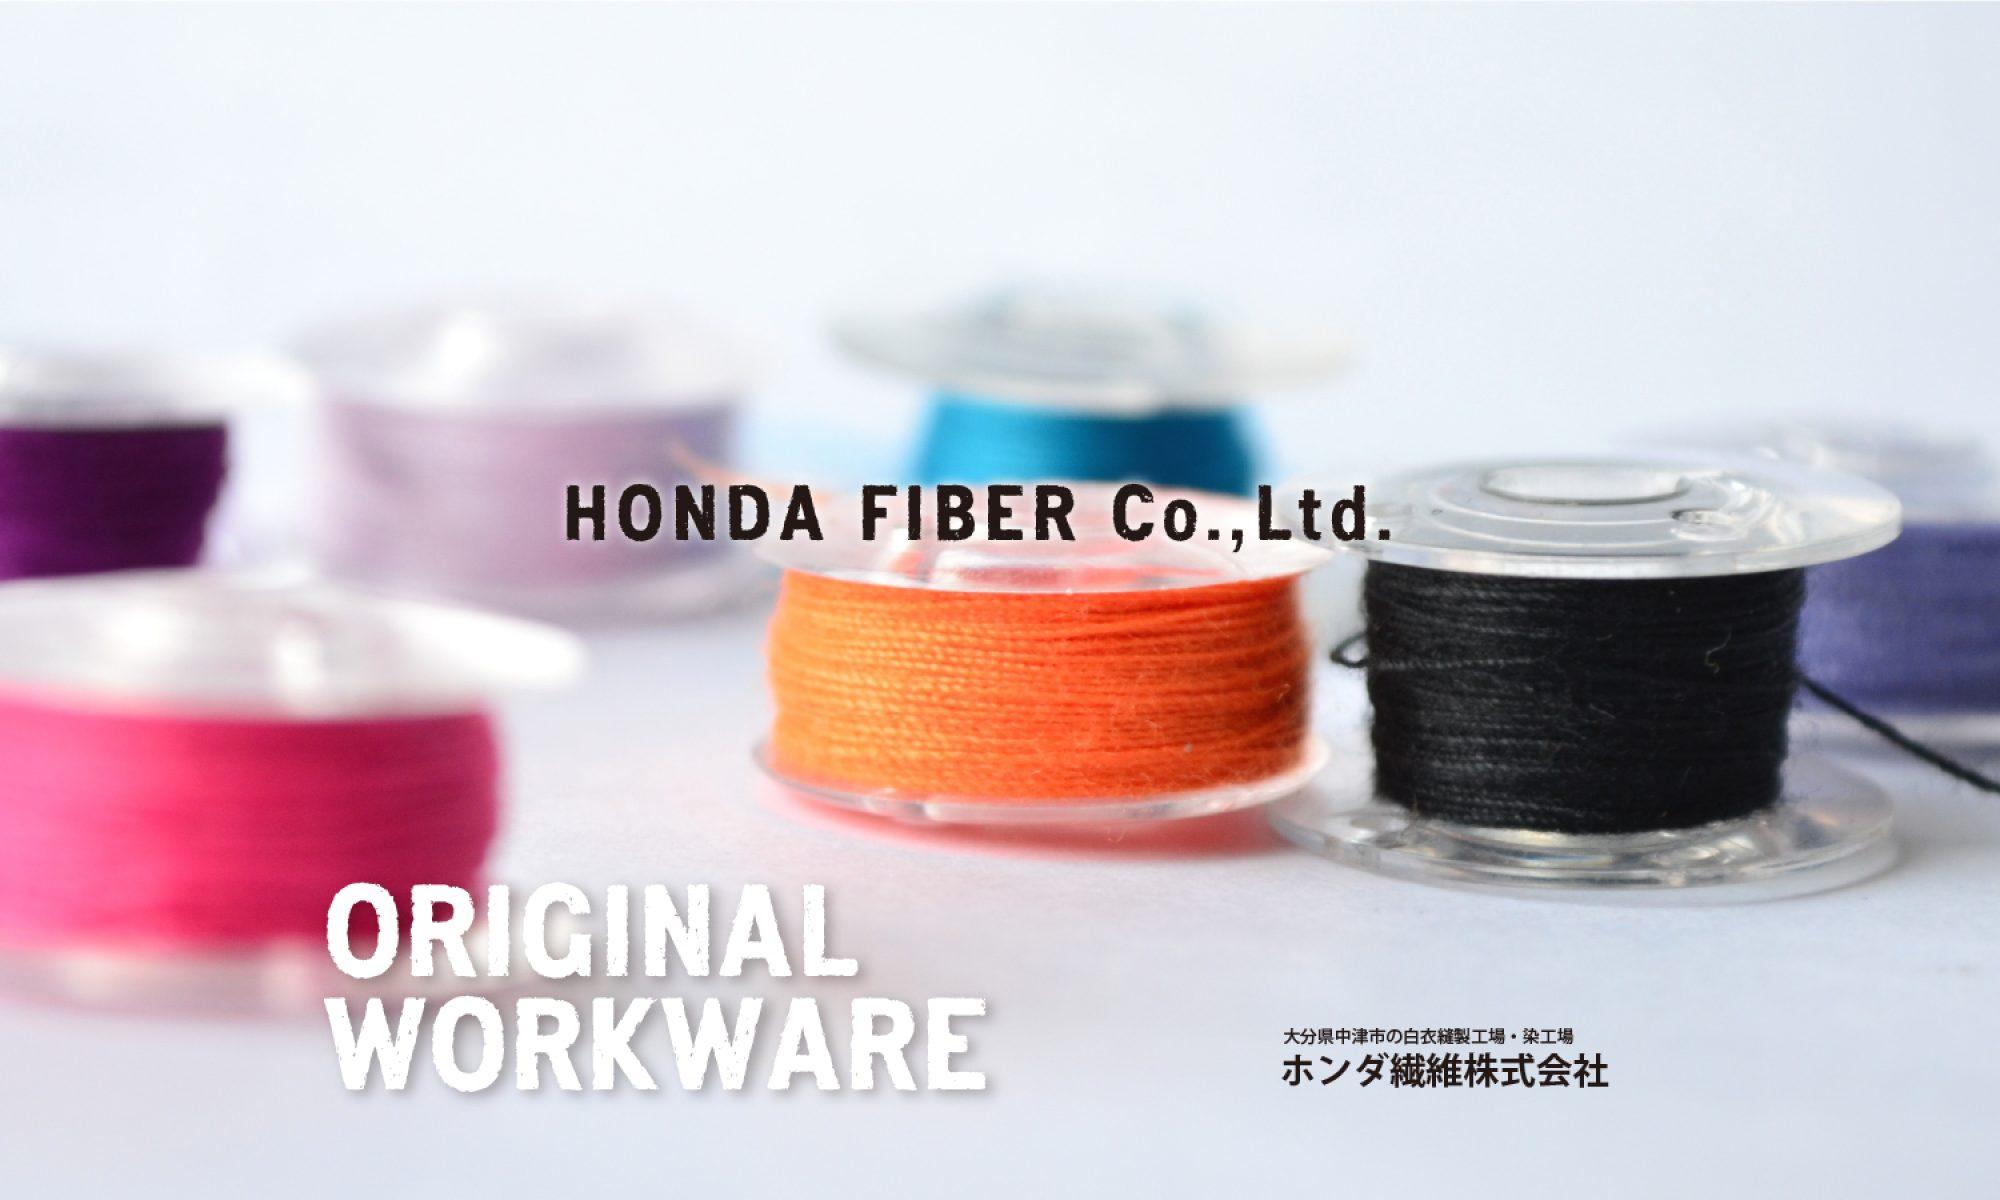 ホンダ繊維株式会社 新着情報